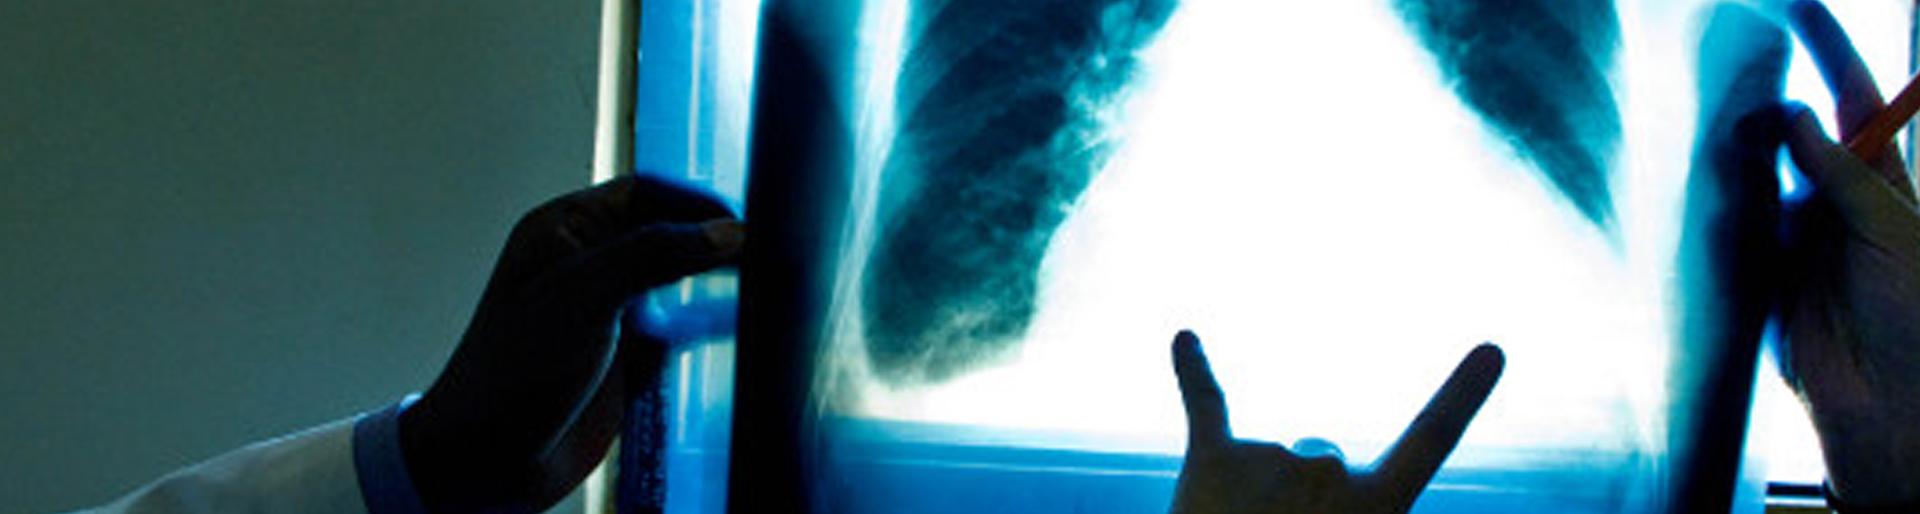 Tuberkulozi